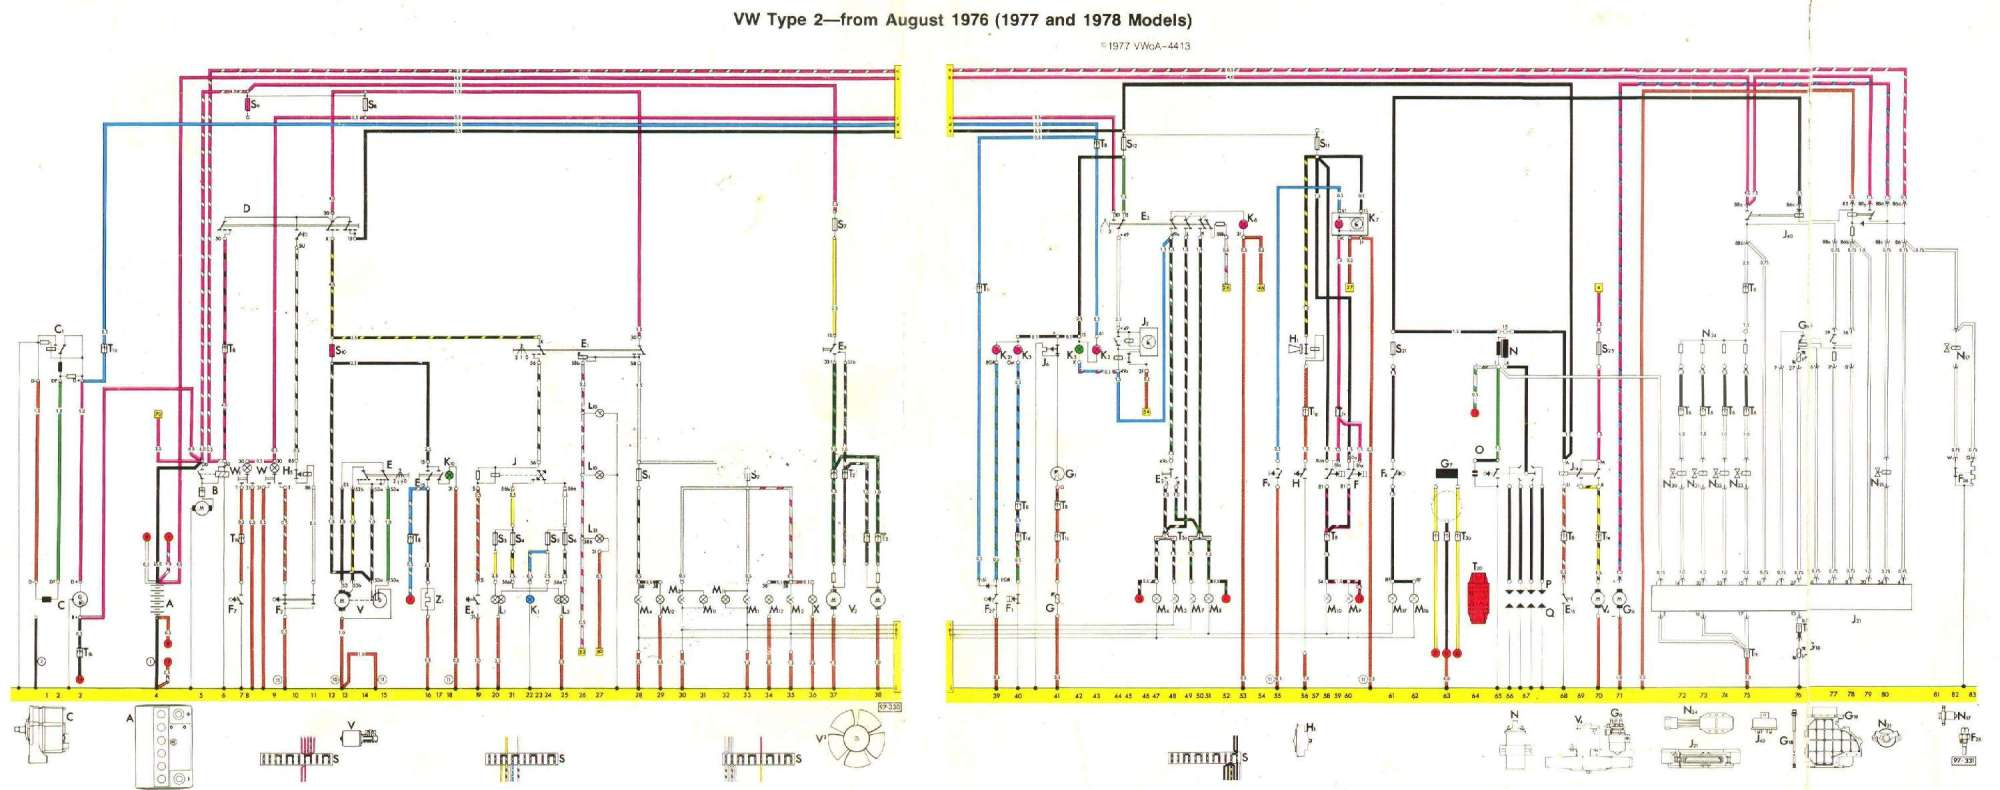 hight resolution of vw wiring diagrams77 vw wiring diagram 9